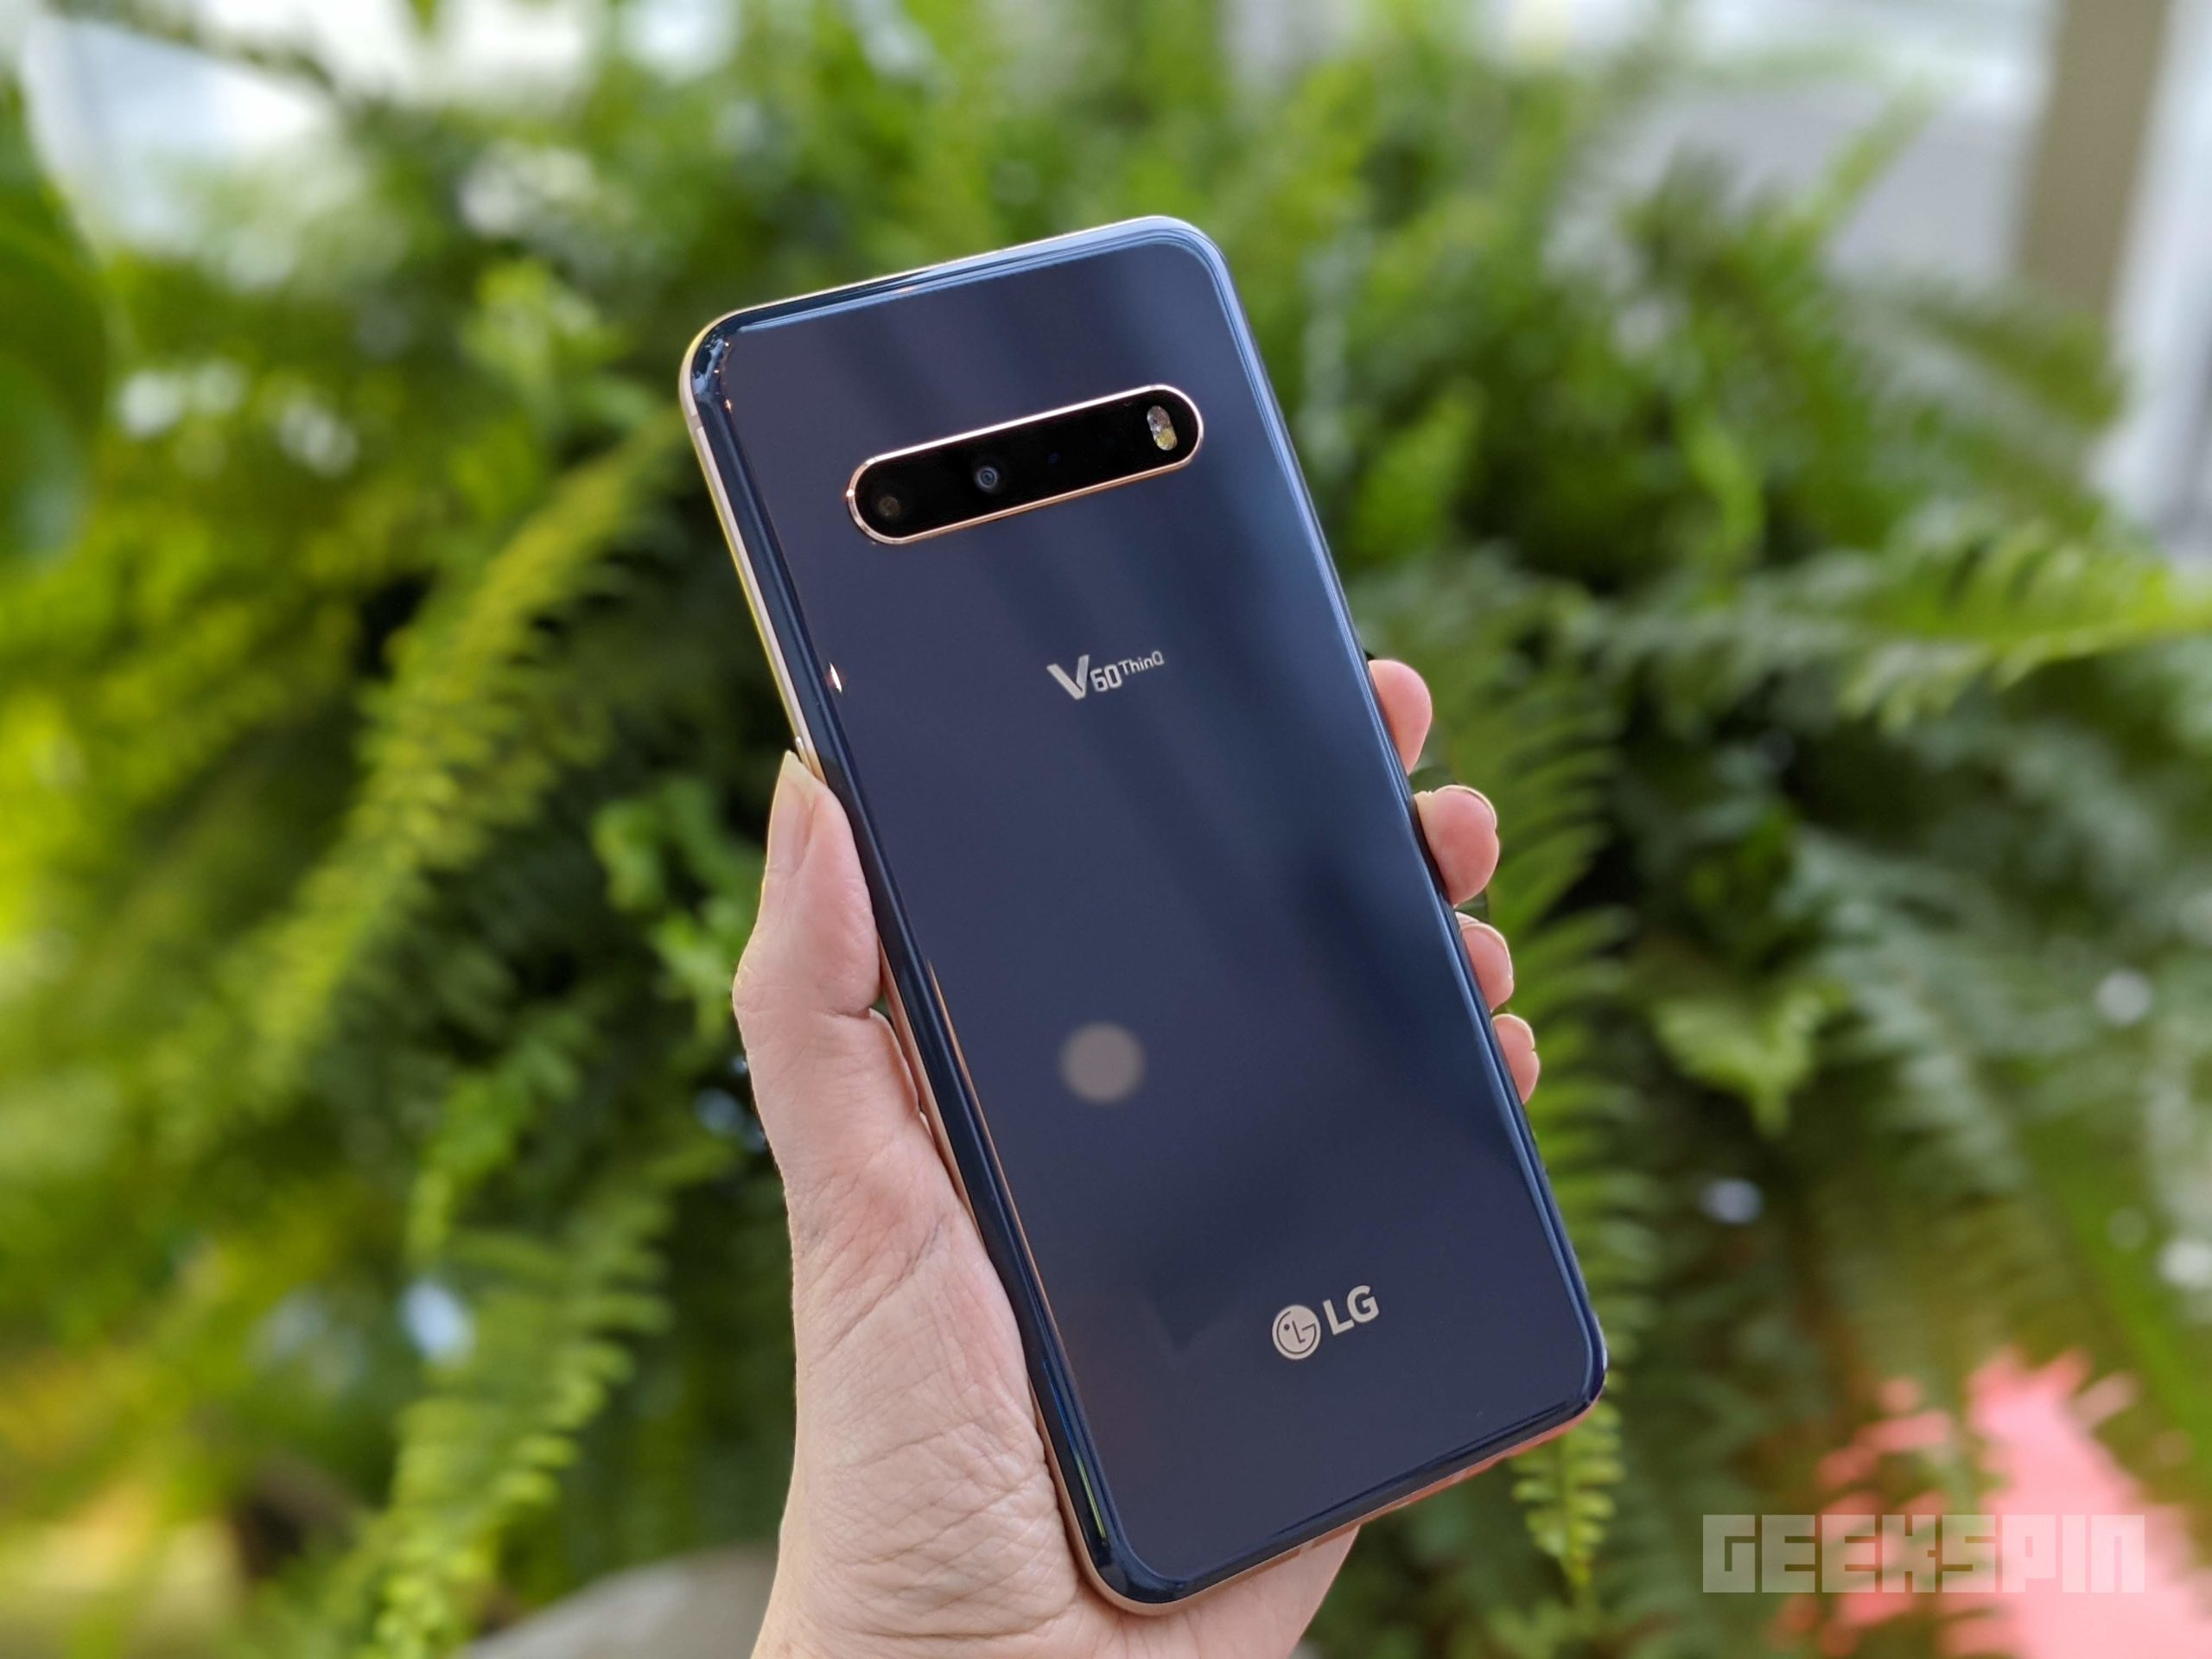 LG V60 ThinQ 5G review: Best phone for quarantine 12